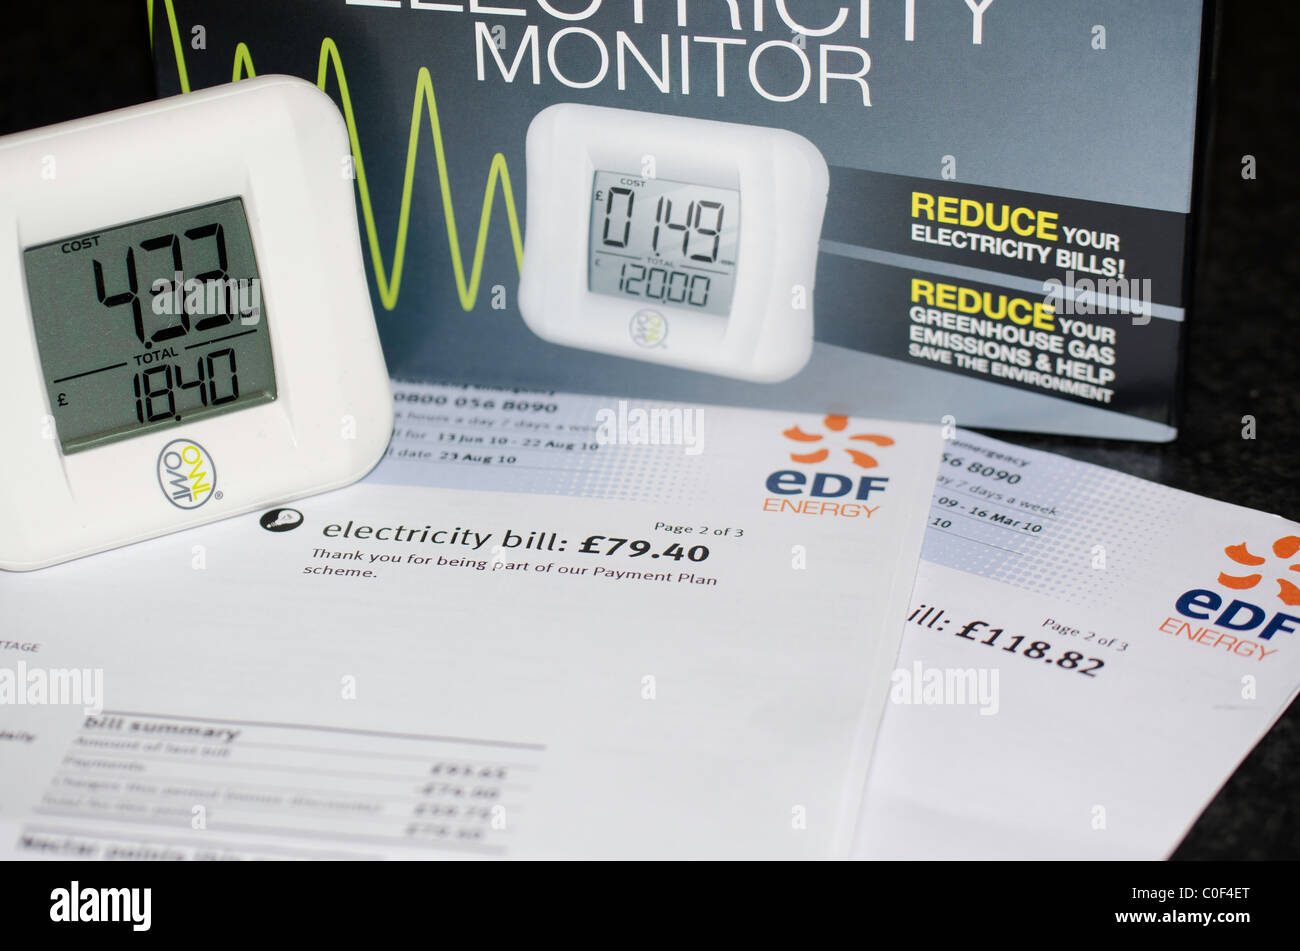 Owl electricity usage monitor, energy awareness - Stock Image